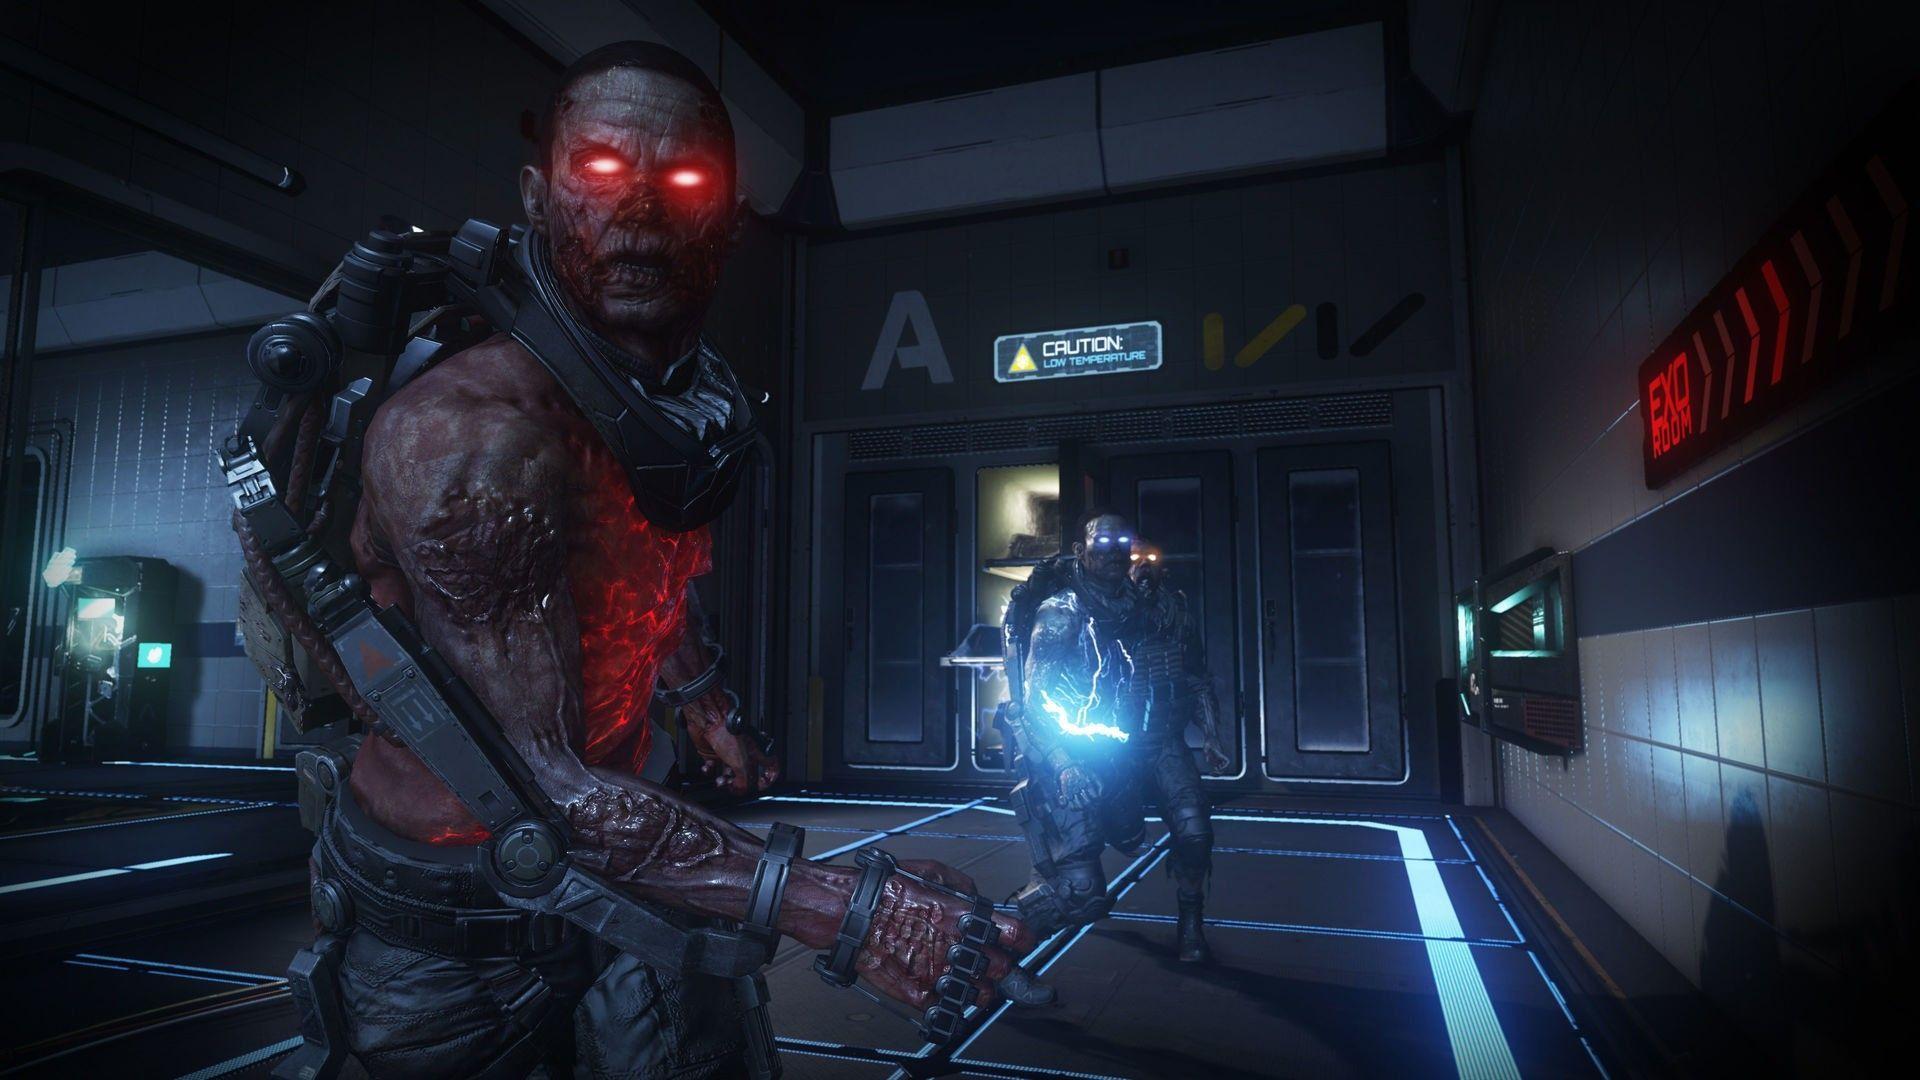 Call of Duty Advanced Warfare Exo Zombies Infection Trailer Zu 1920x1080